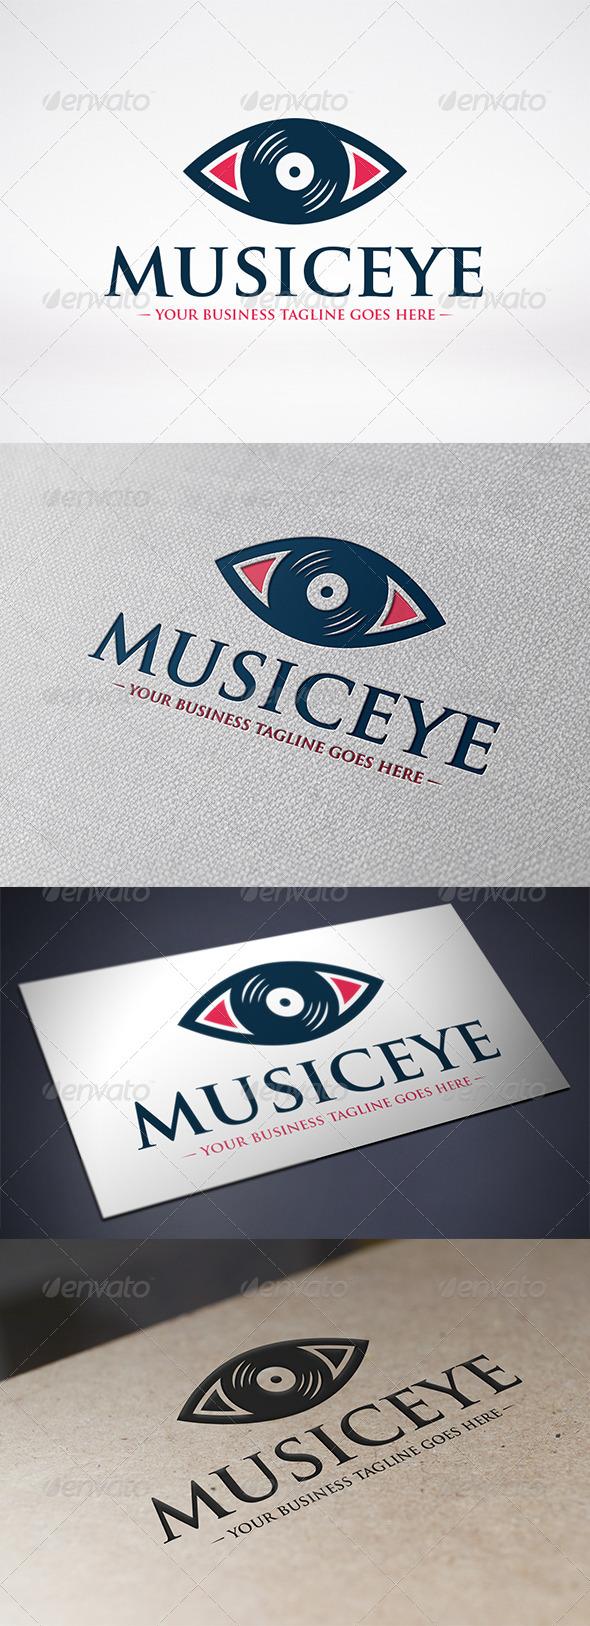 Music Eye Logo Template